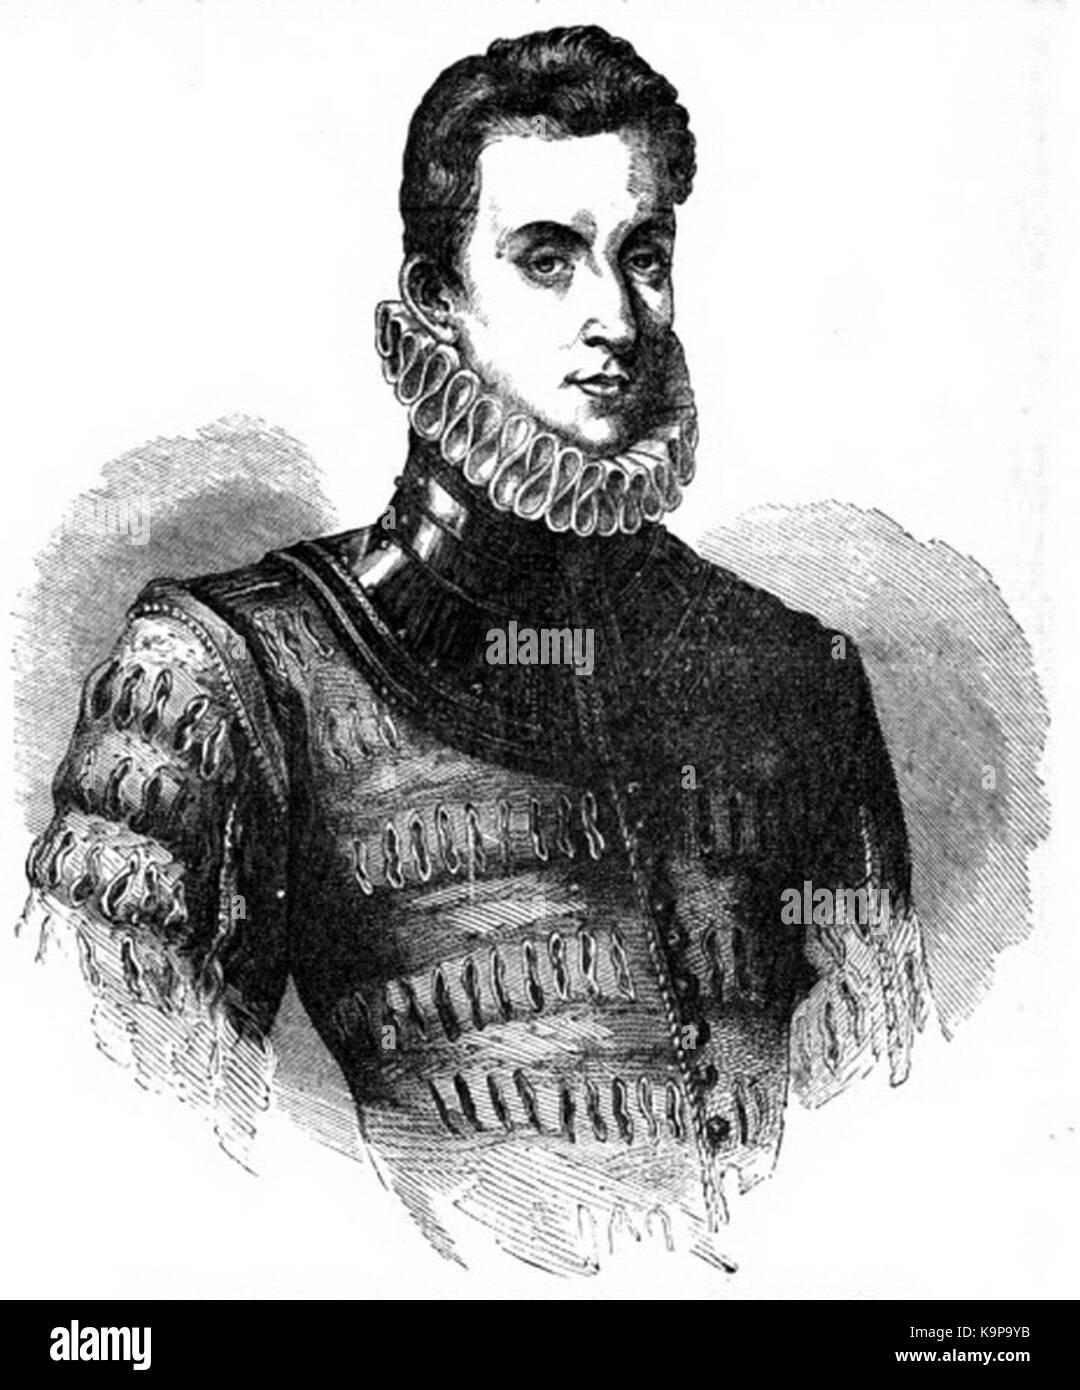 P510 Sir Philip Sidney - Stock Image